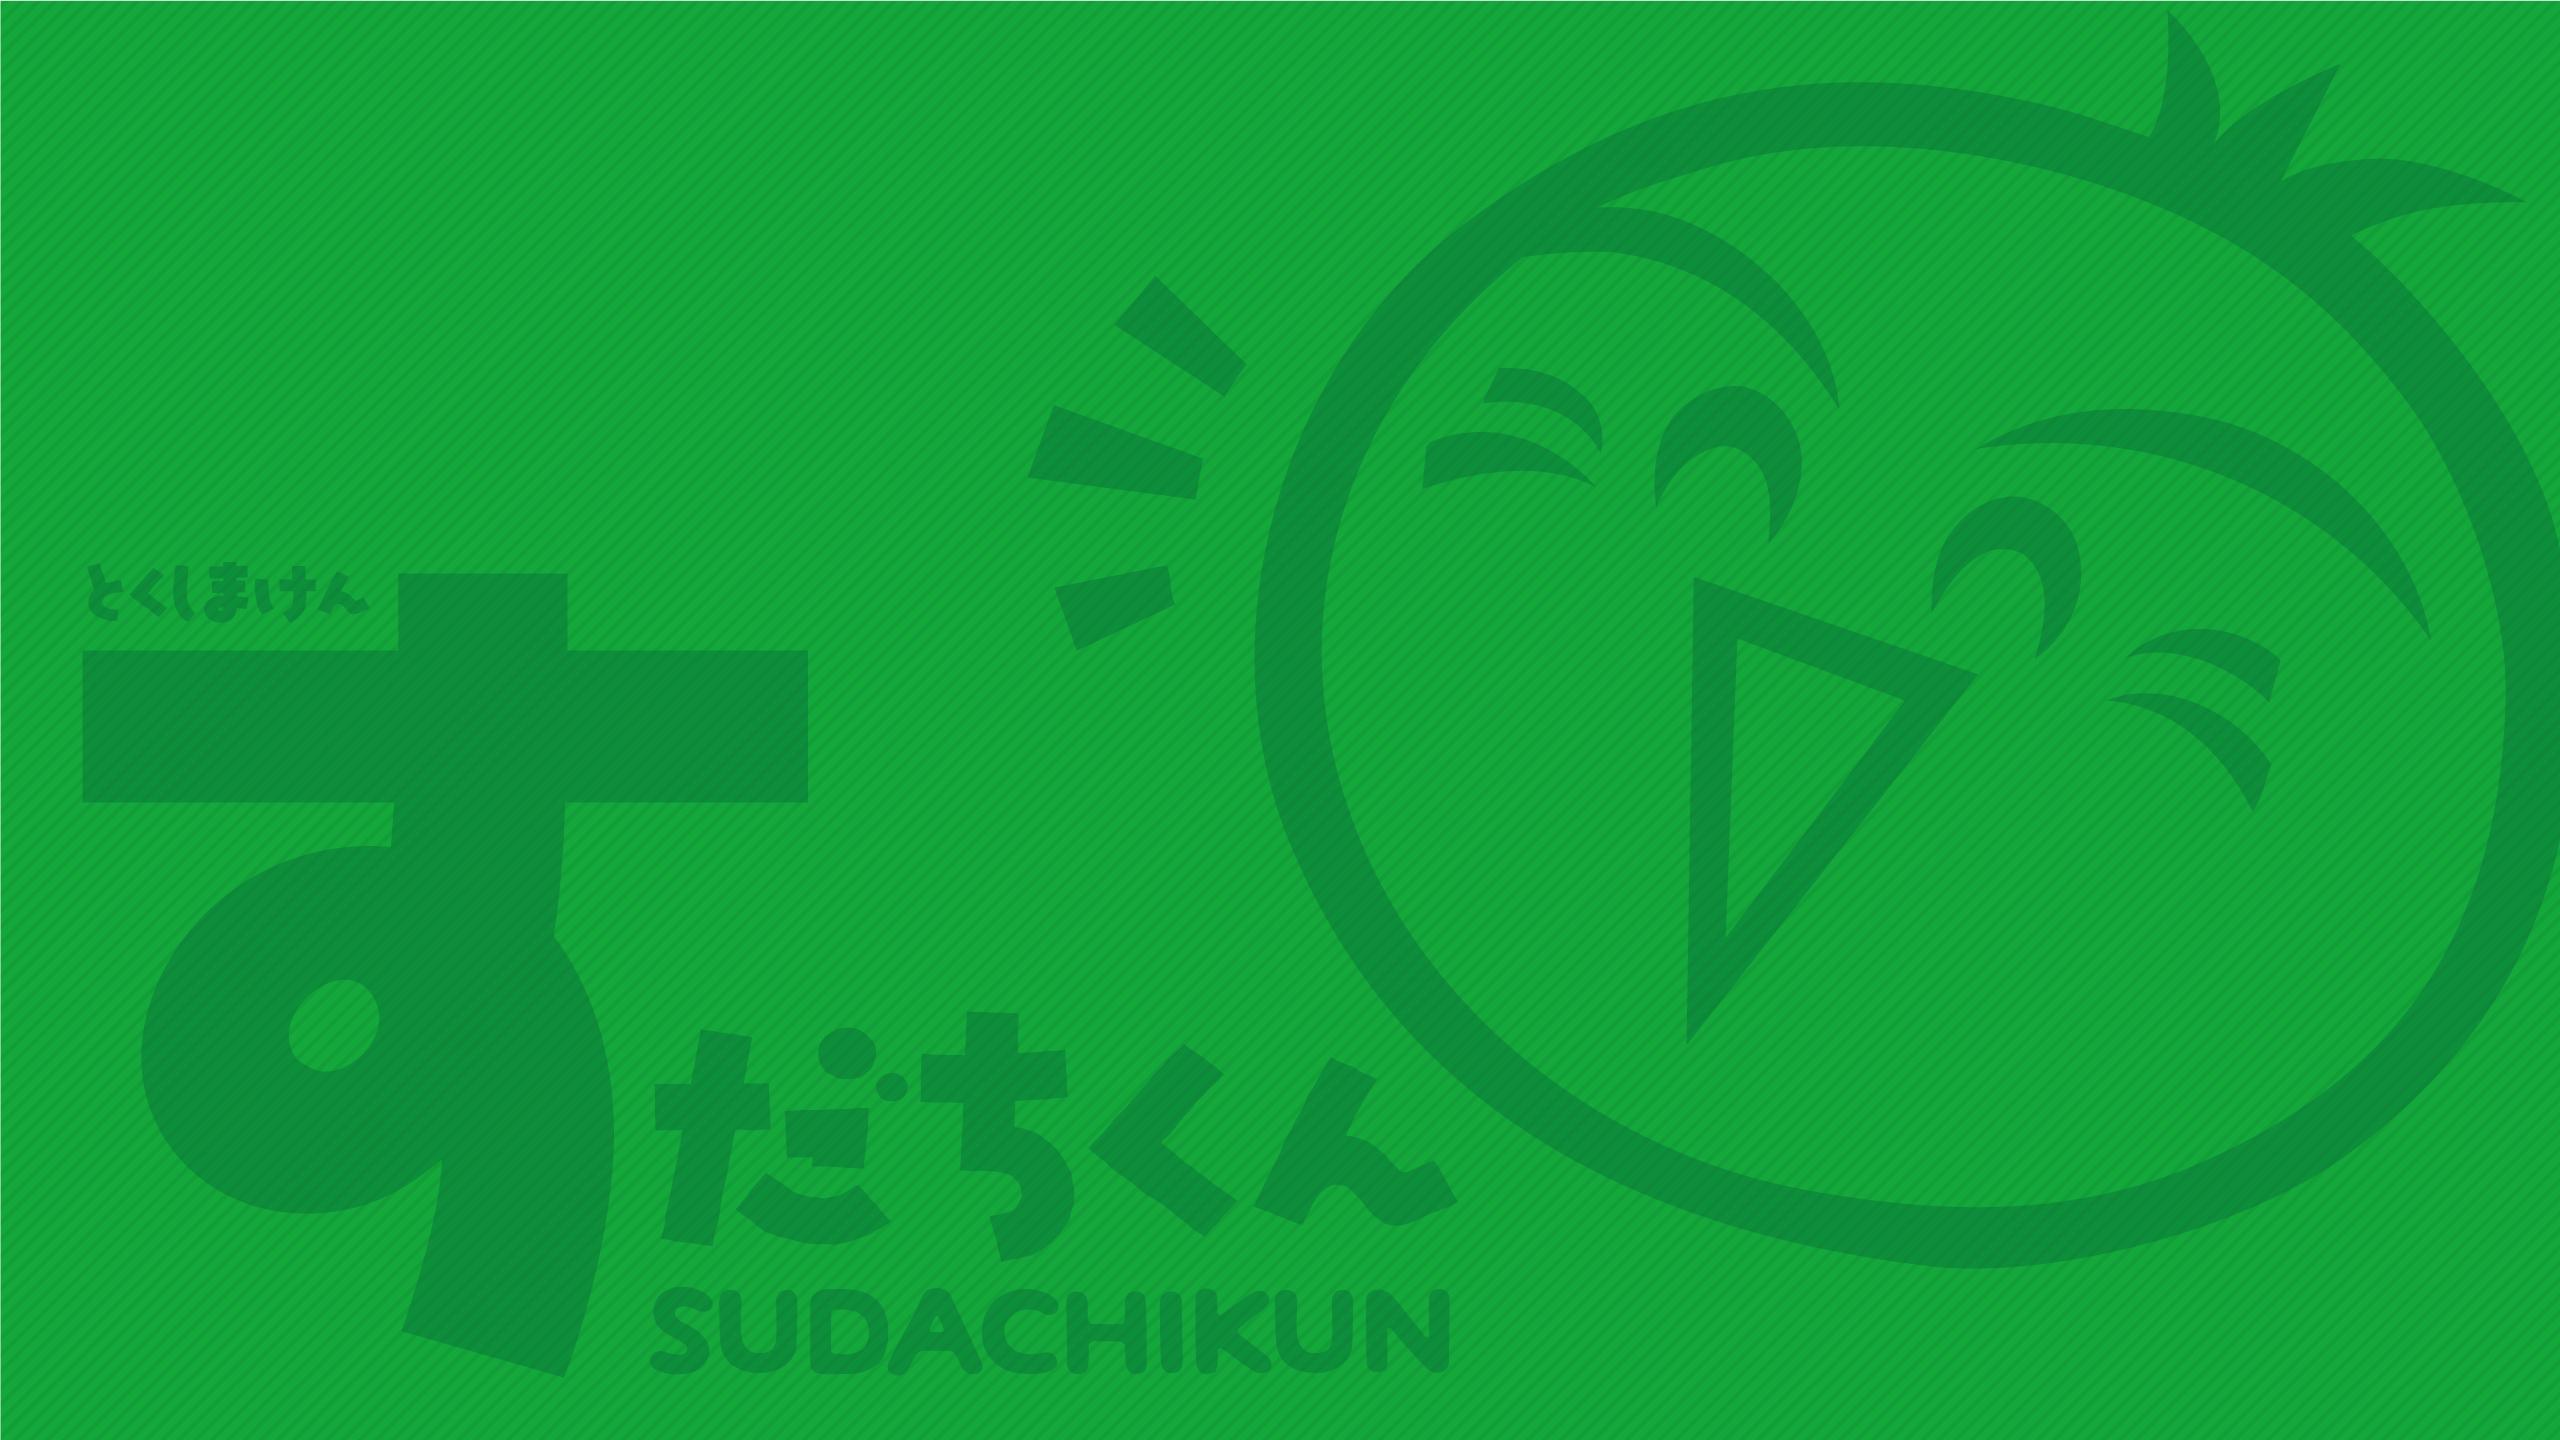 sudachi1_2560×1440